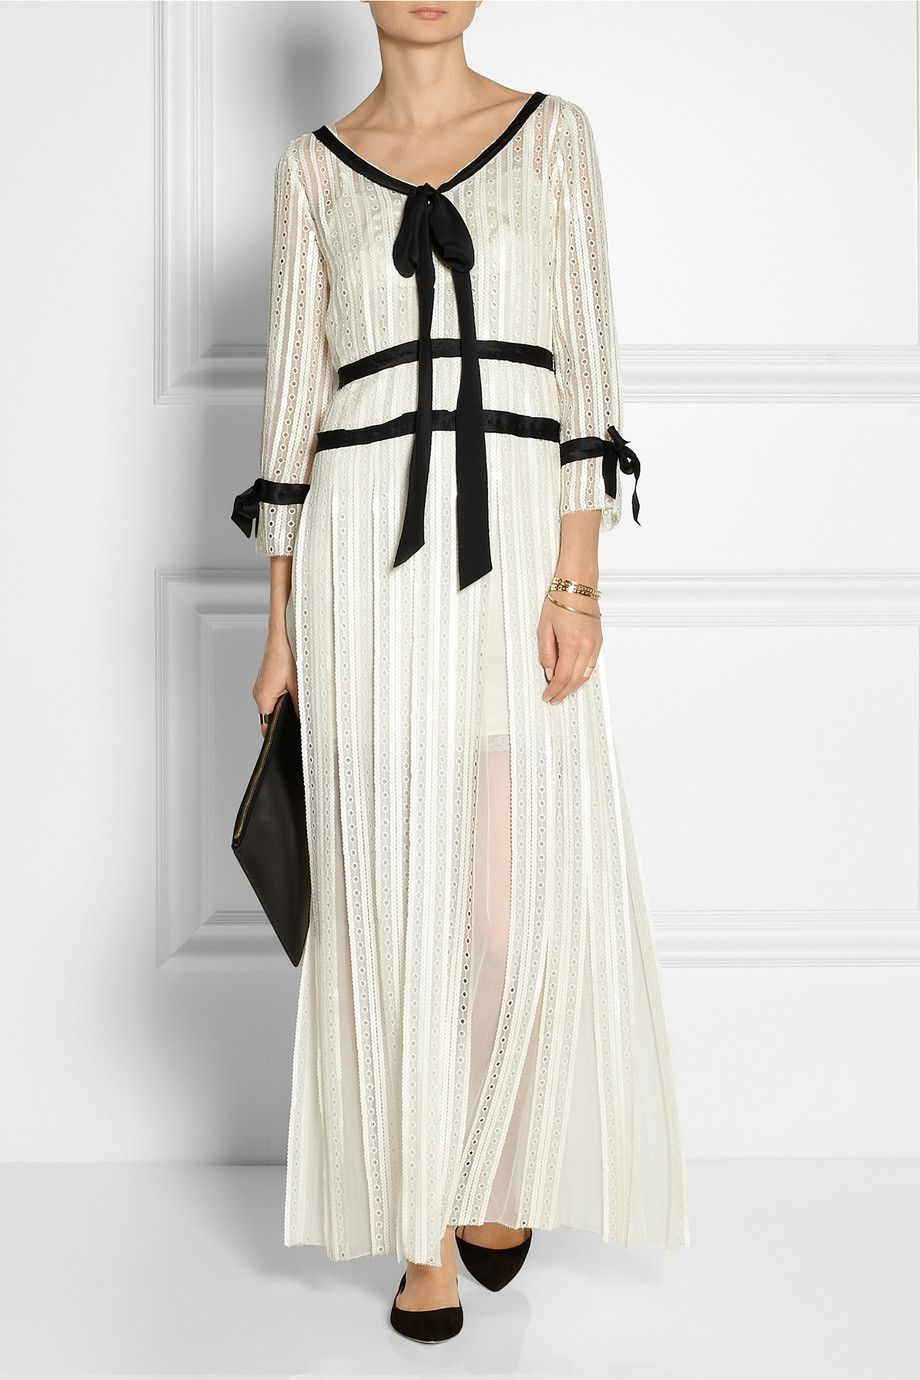 d499897fa Marc Jacobs | Embellished eyelet-chiffon maxi dress | NET-A-PORTER.COM